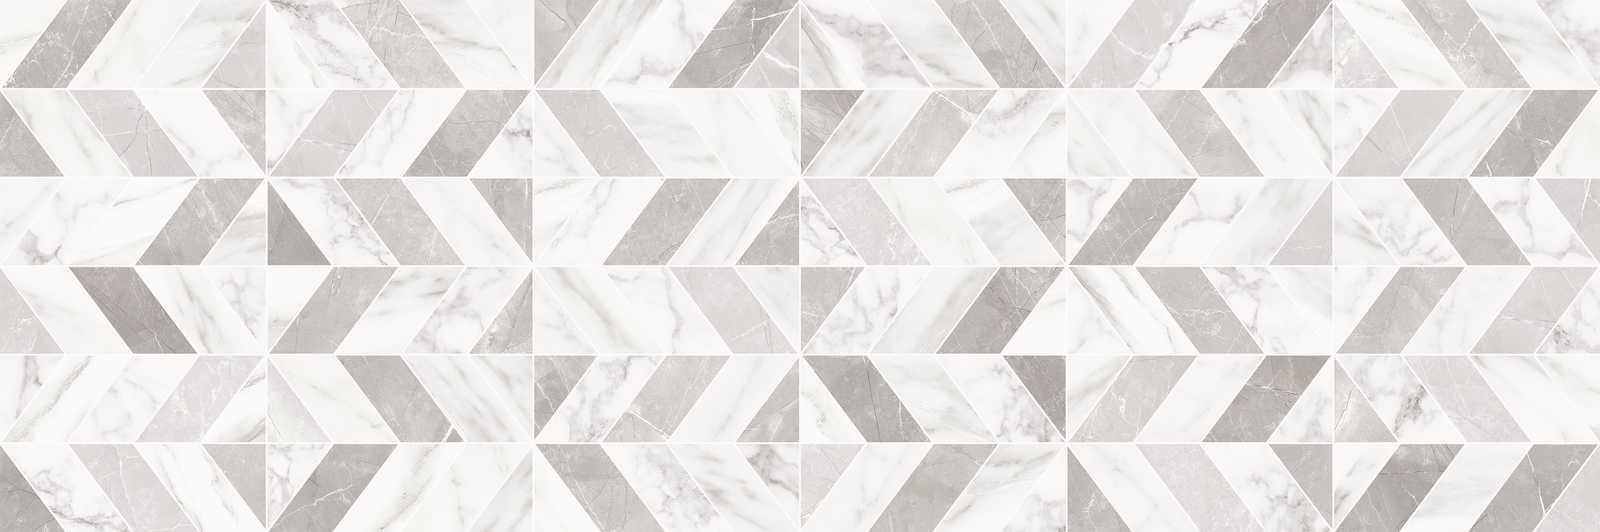 Декор Marbleplay Decoro Naos White/Statuarietto 30x90